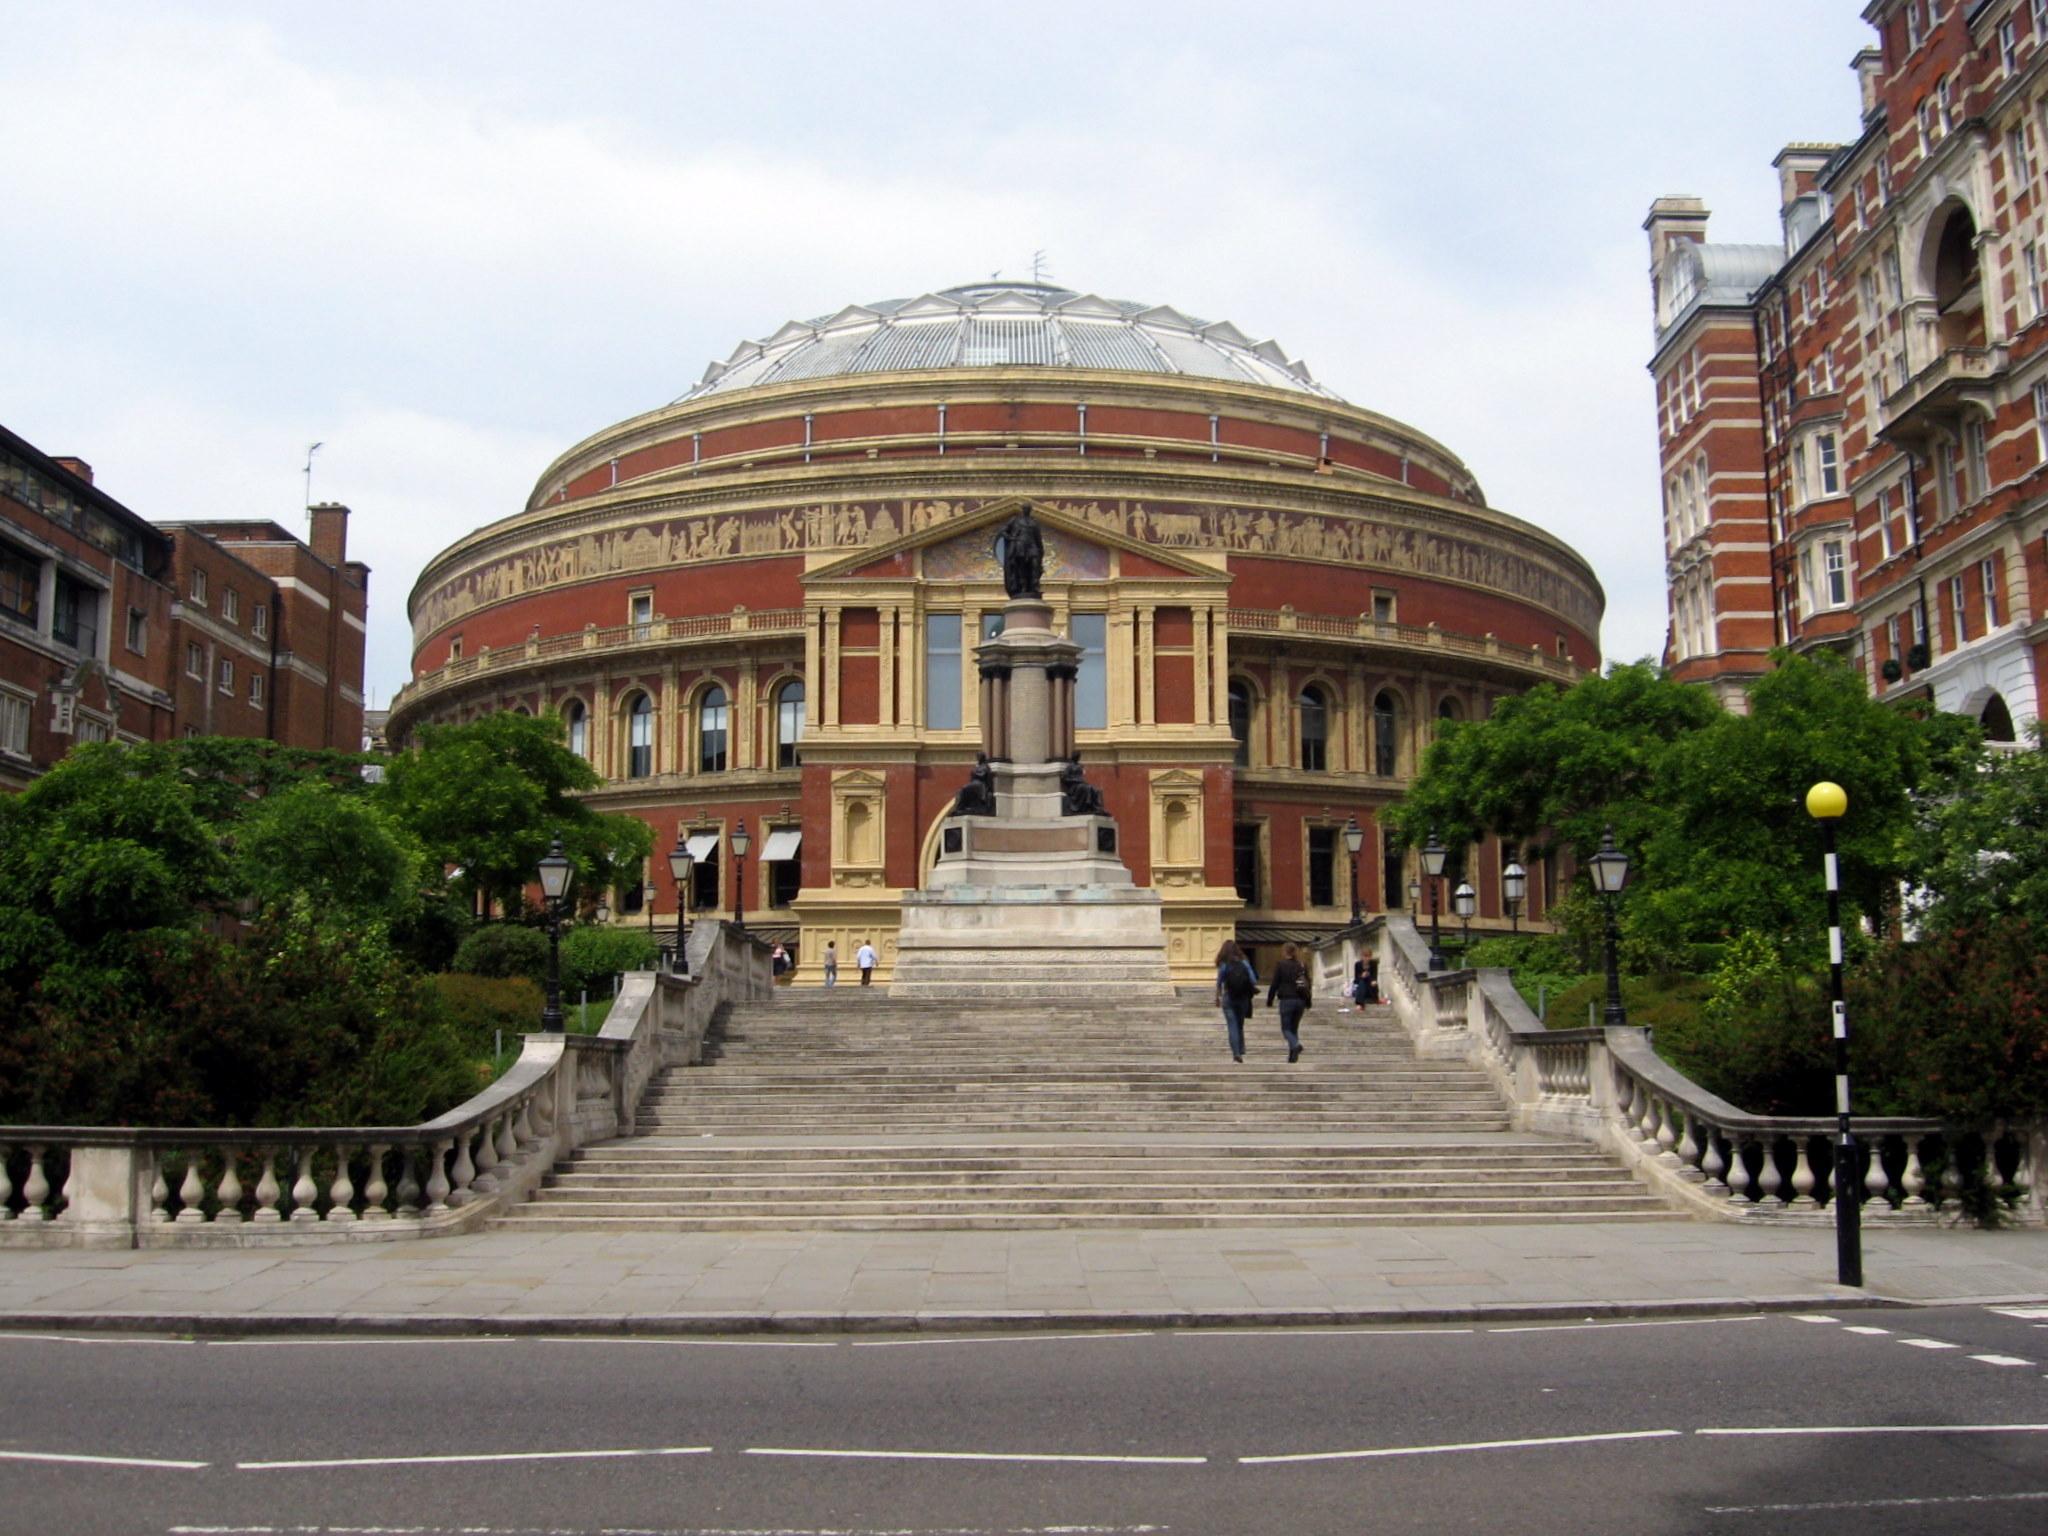 Royal_Albert_Hall,_London,_from_Prince_Consort_Road